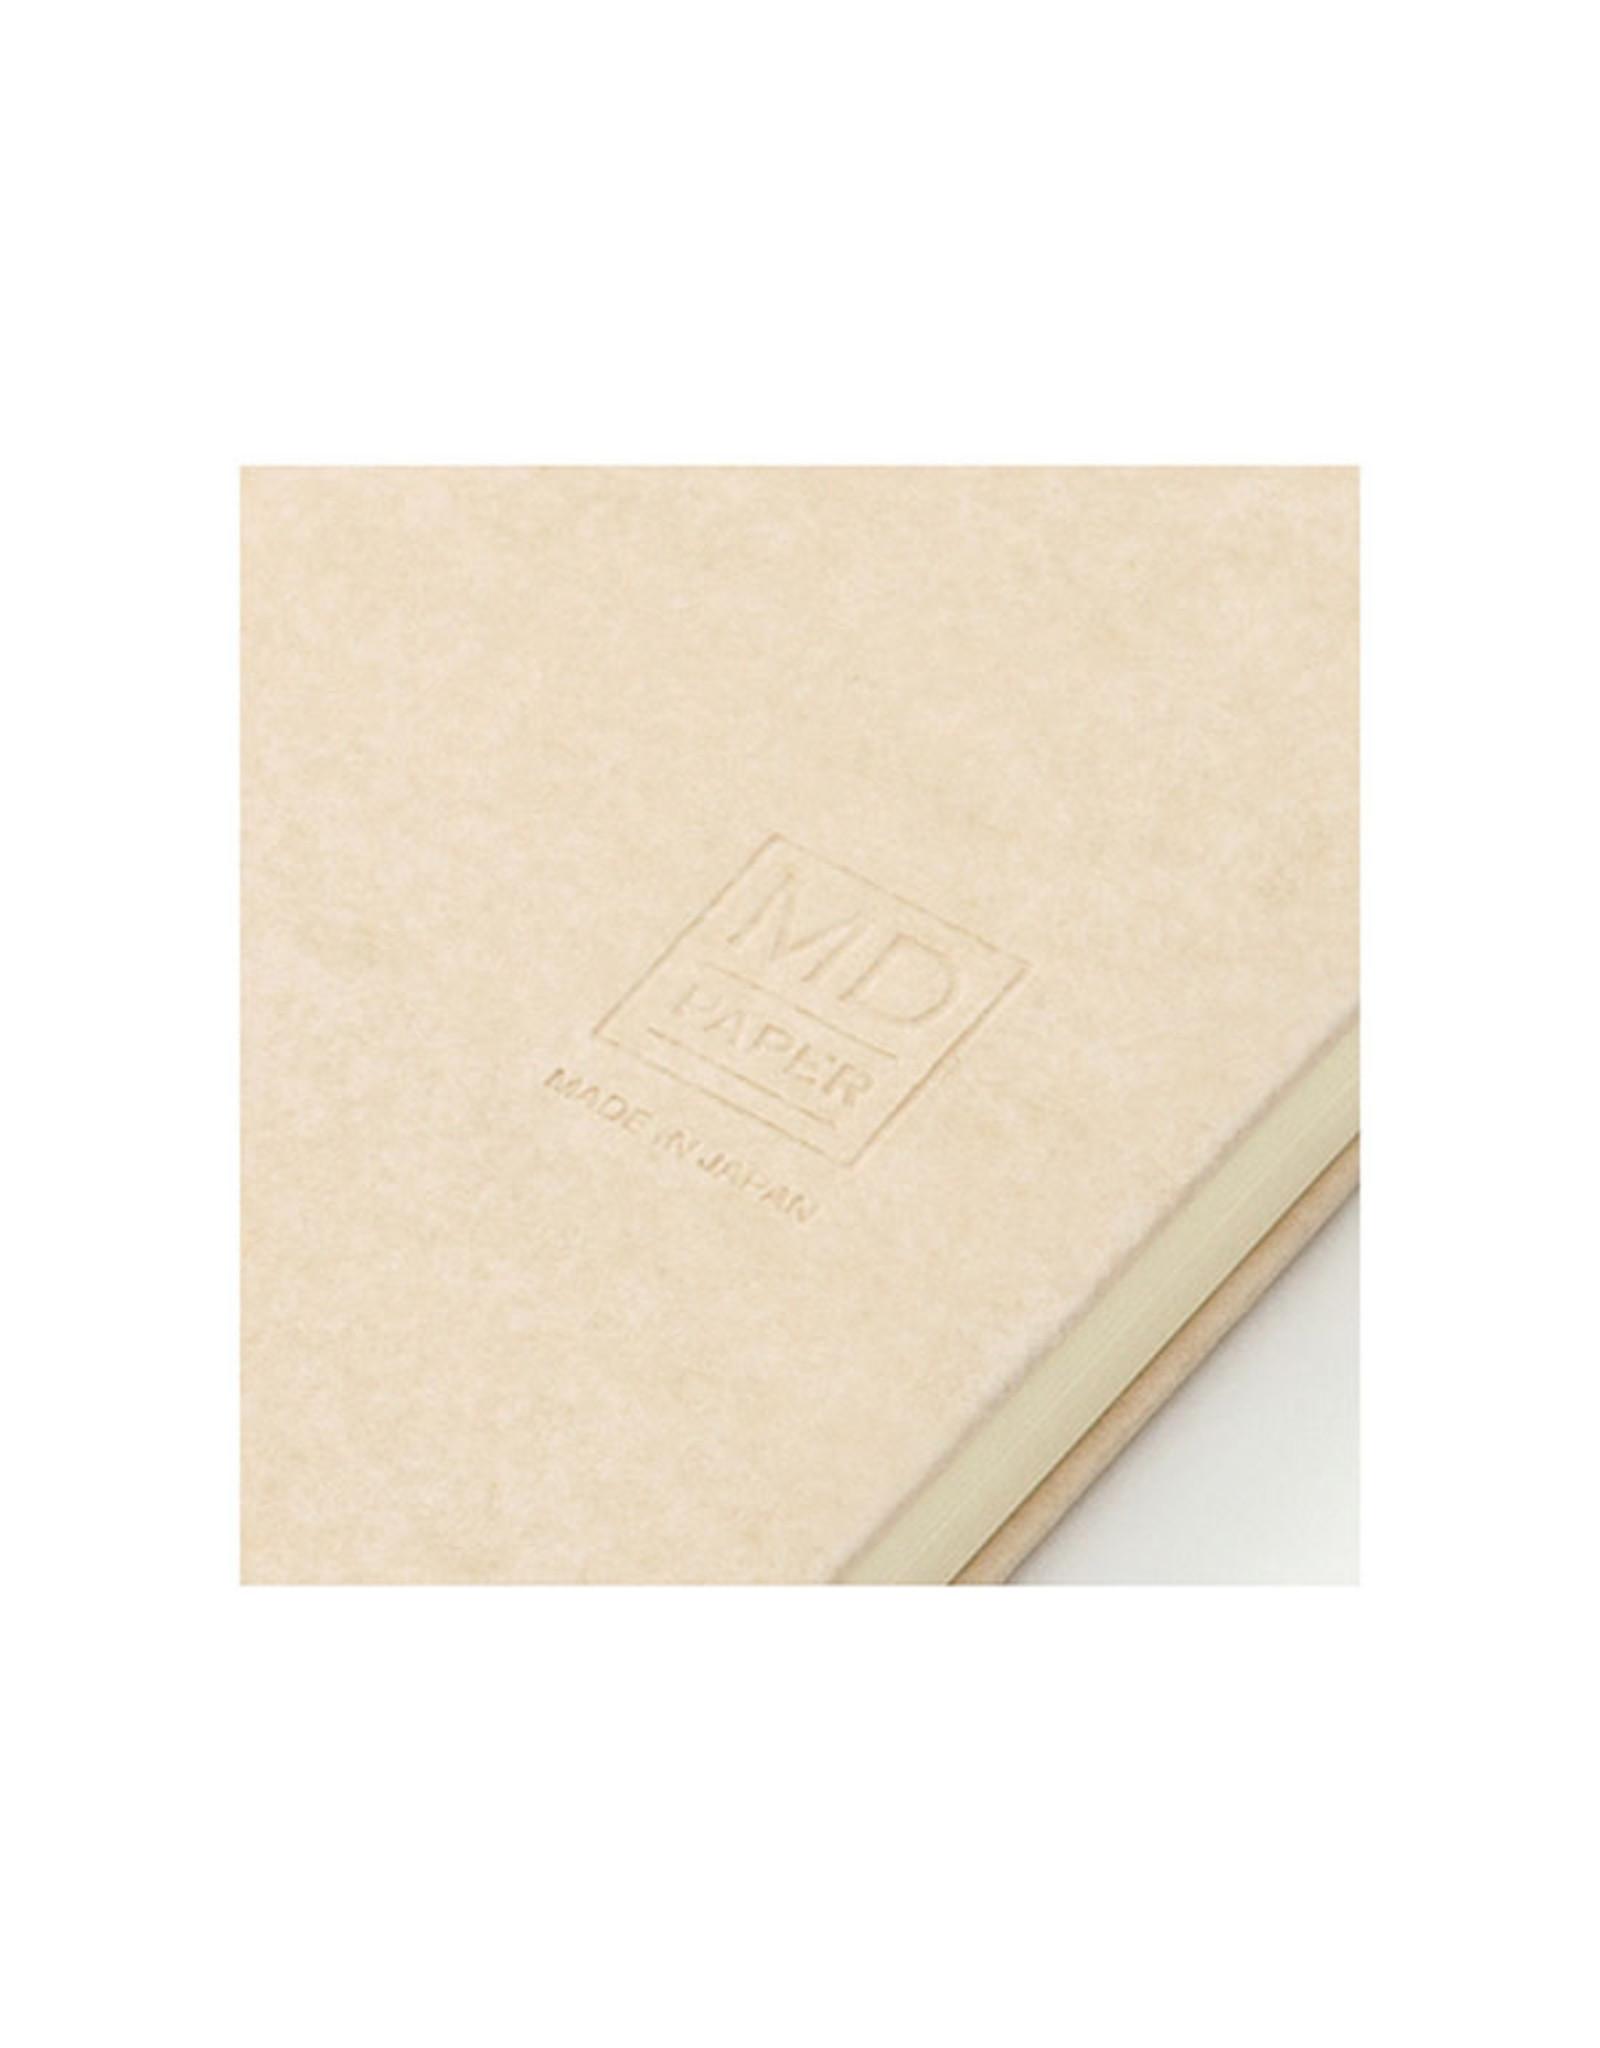 Designphil Inc. MD PAPER COVER B6 SLIM